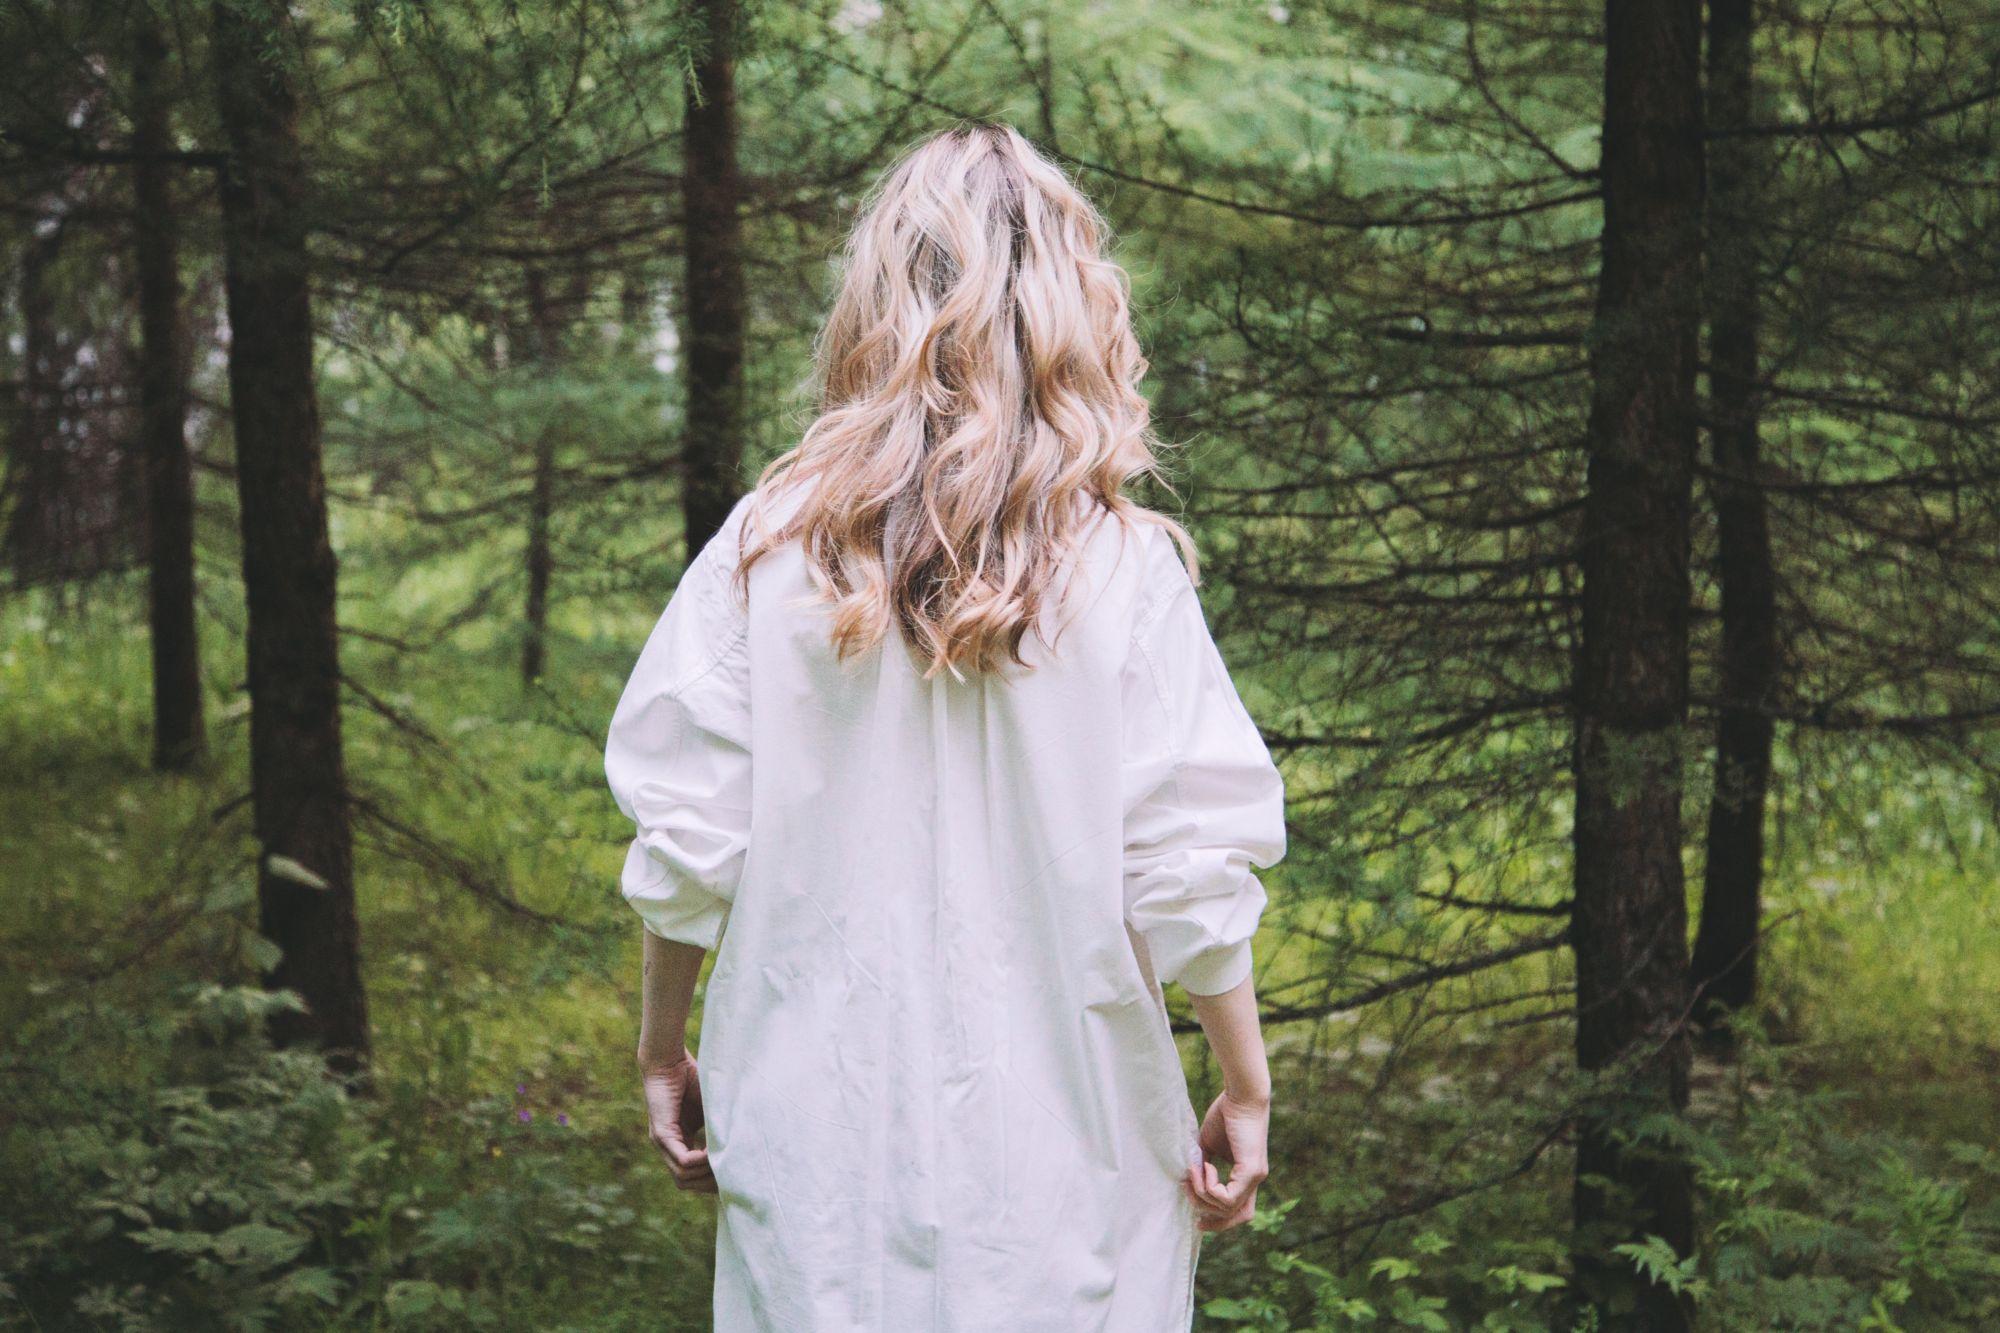 Žena jde dolesa meditovat